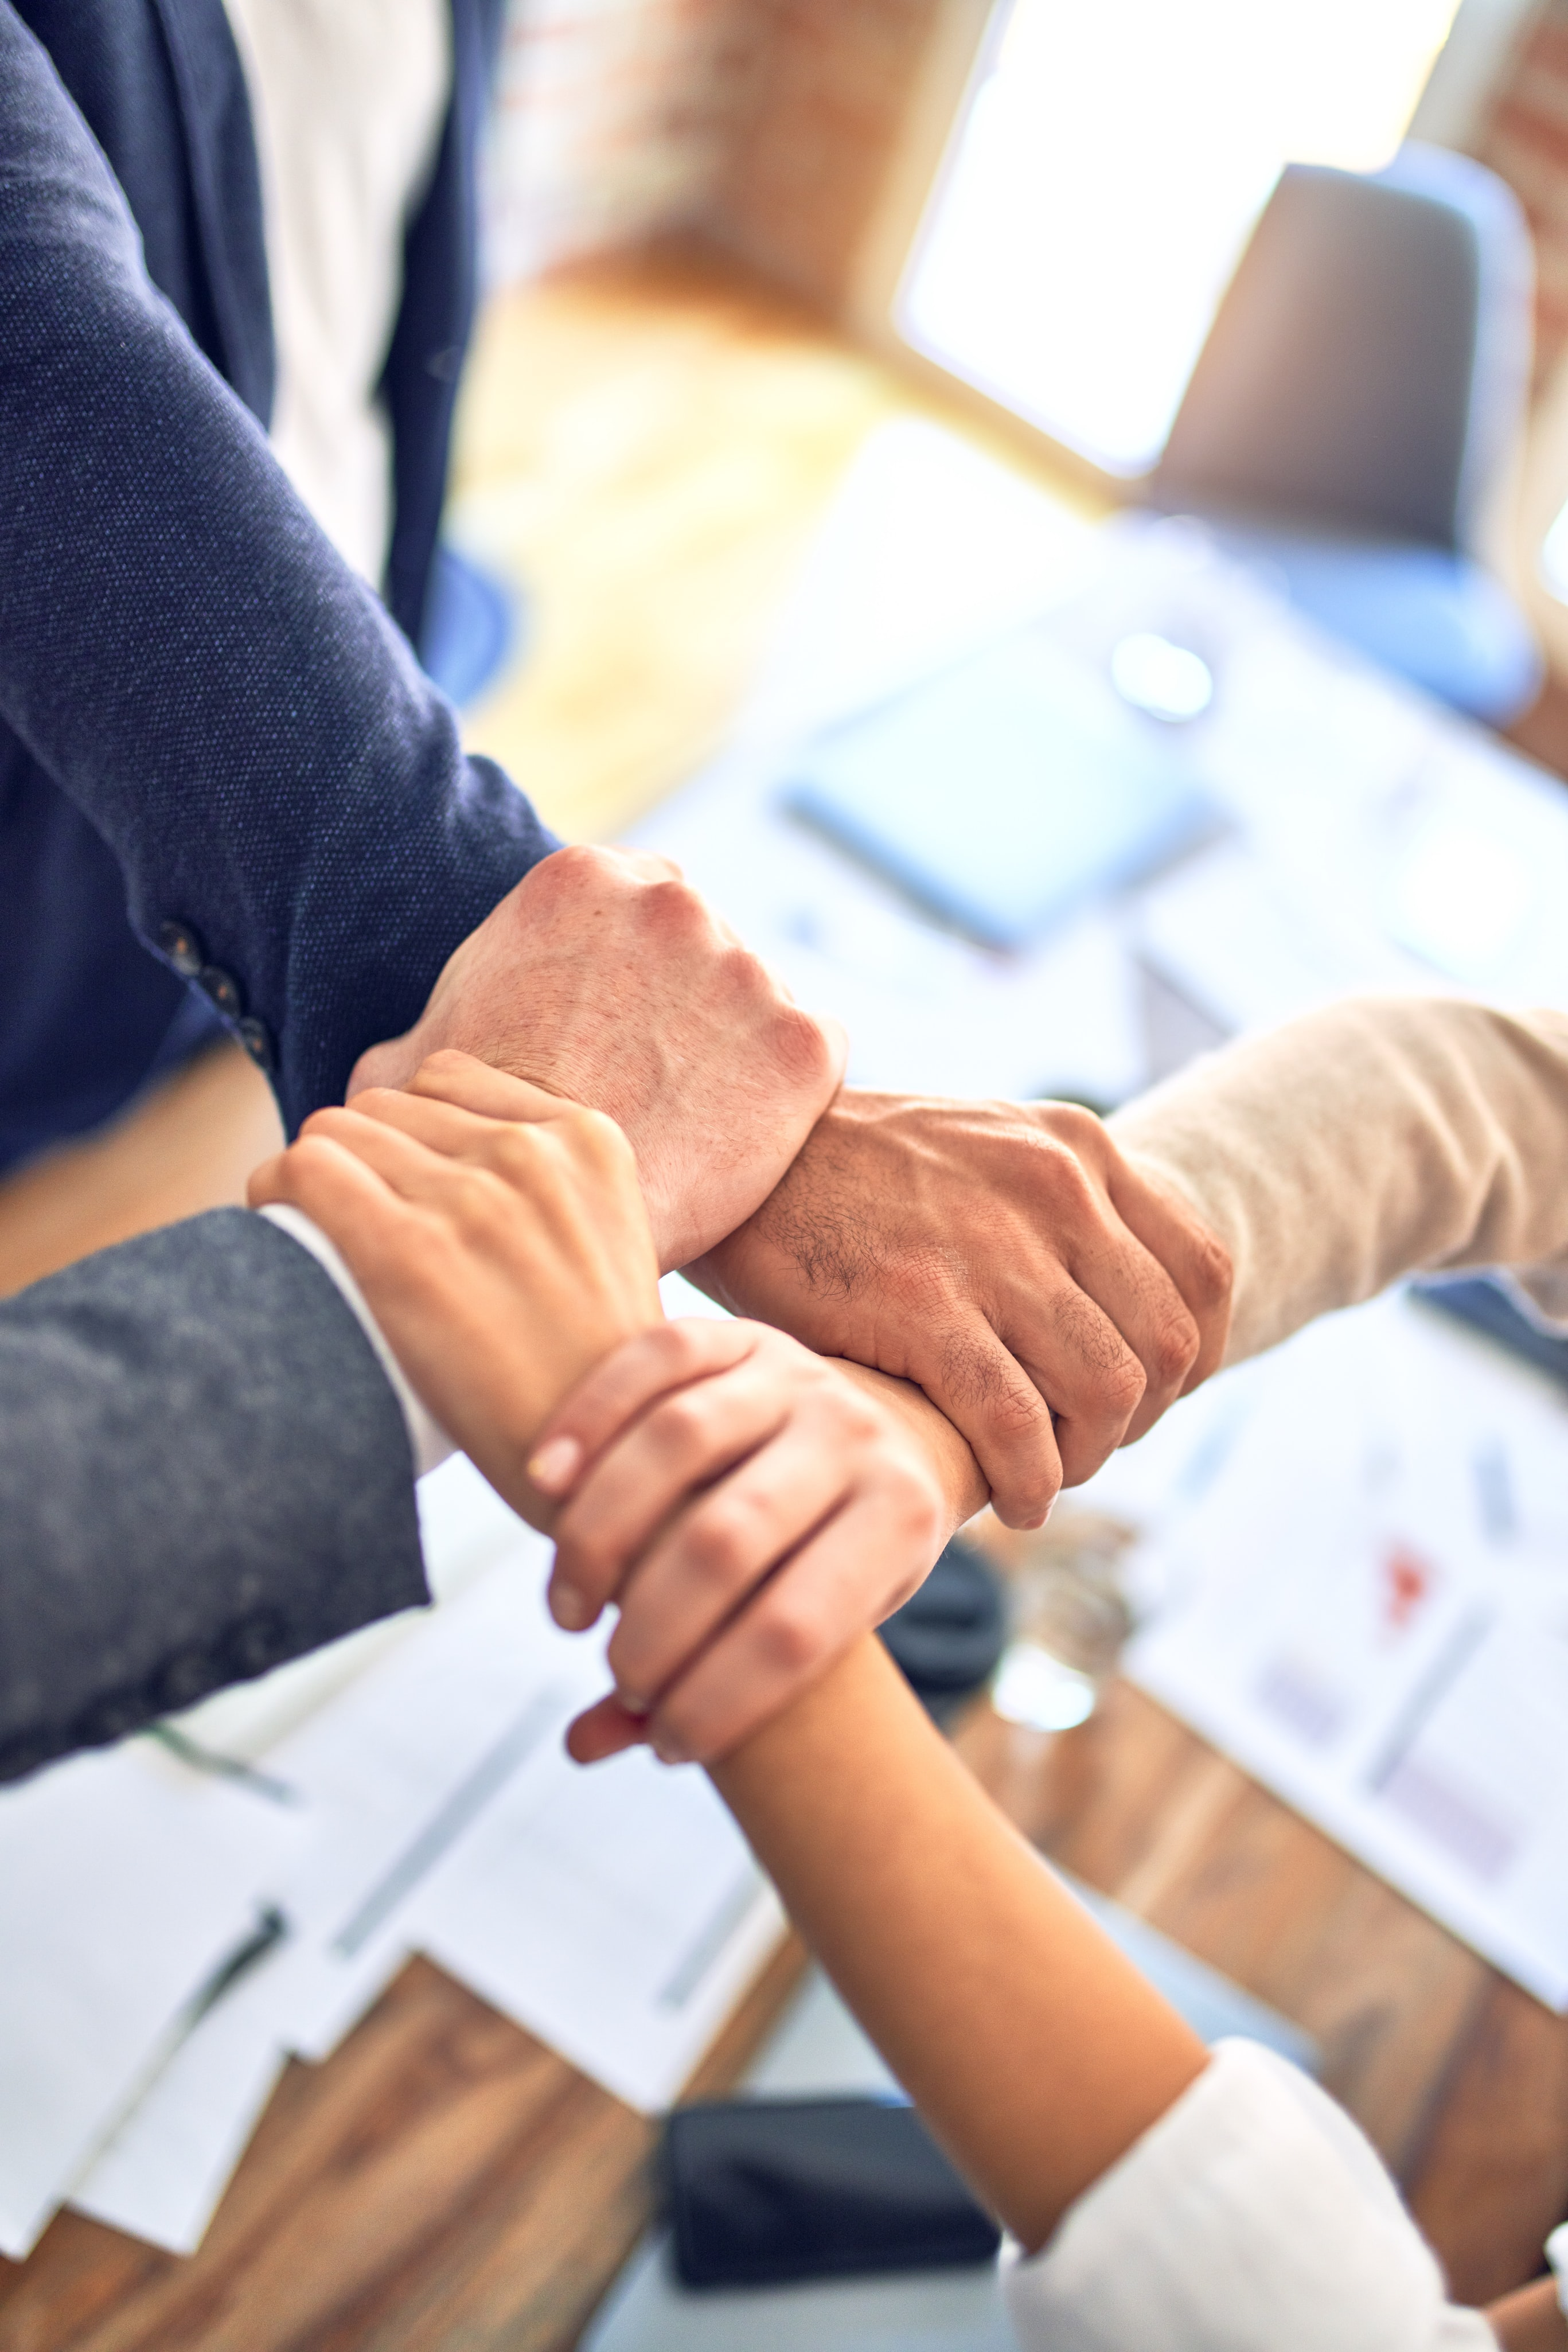 Customer Relationships: Building Trust